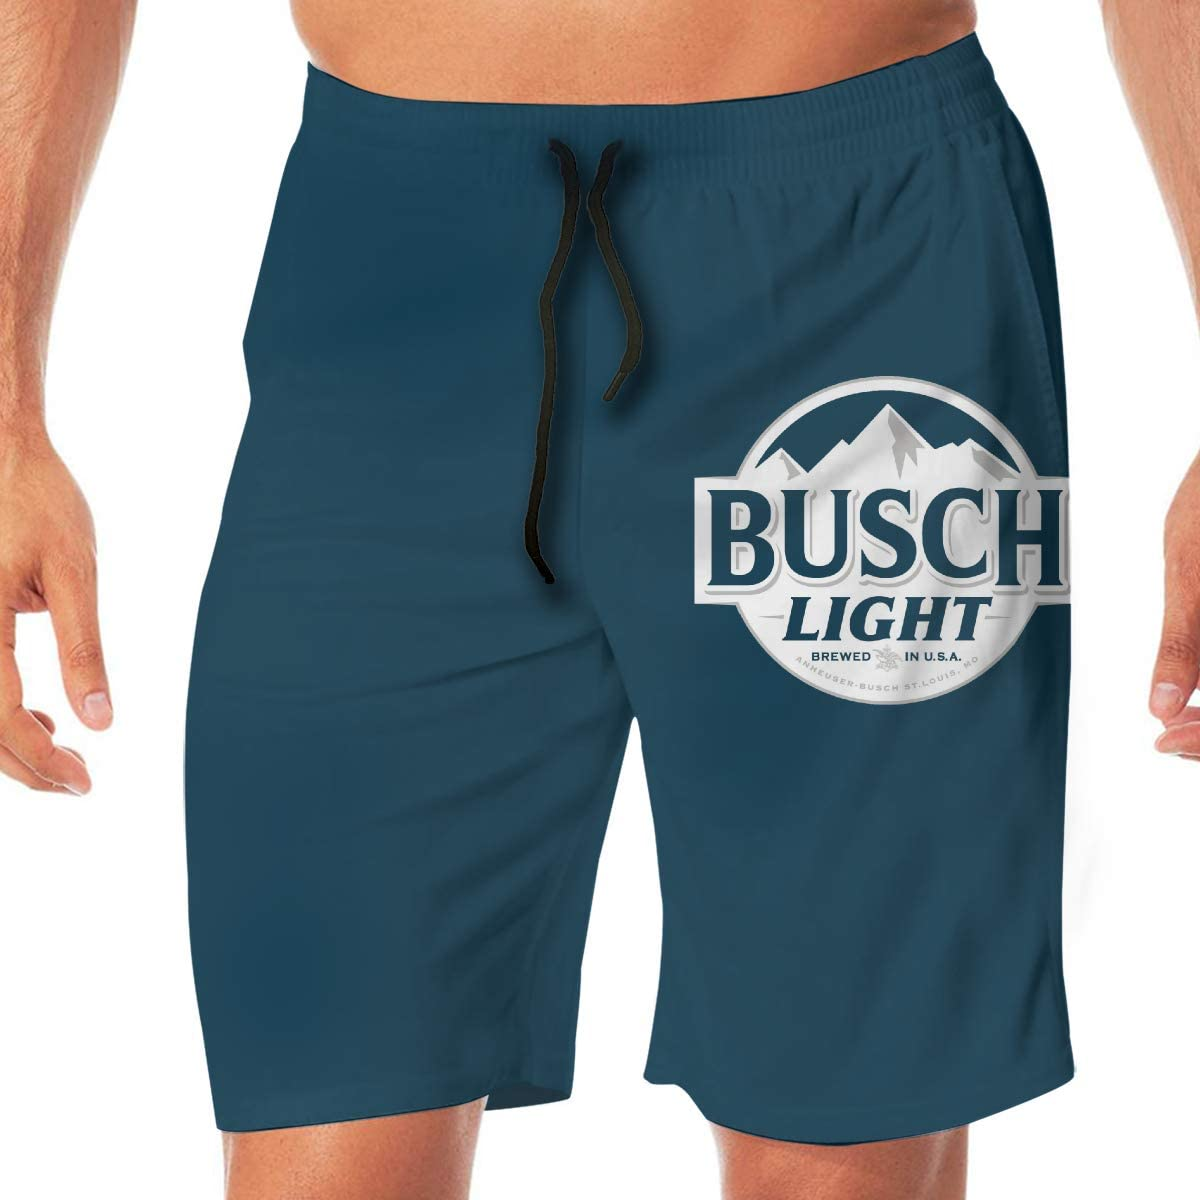 Mens Swimming Board Boy Shorts Trunks Summer Holiday Beach Sports Pants Swimwear